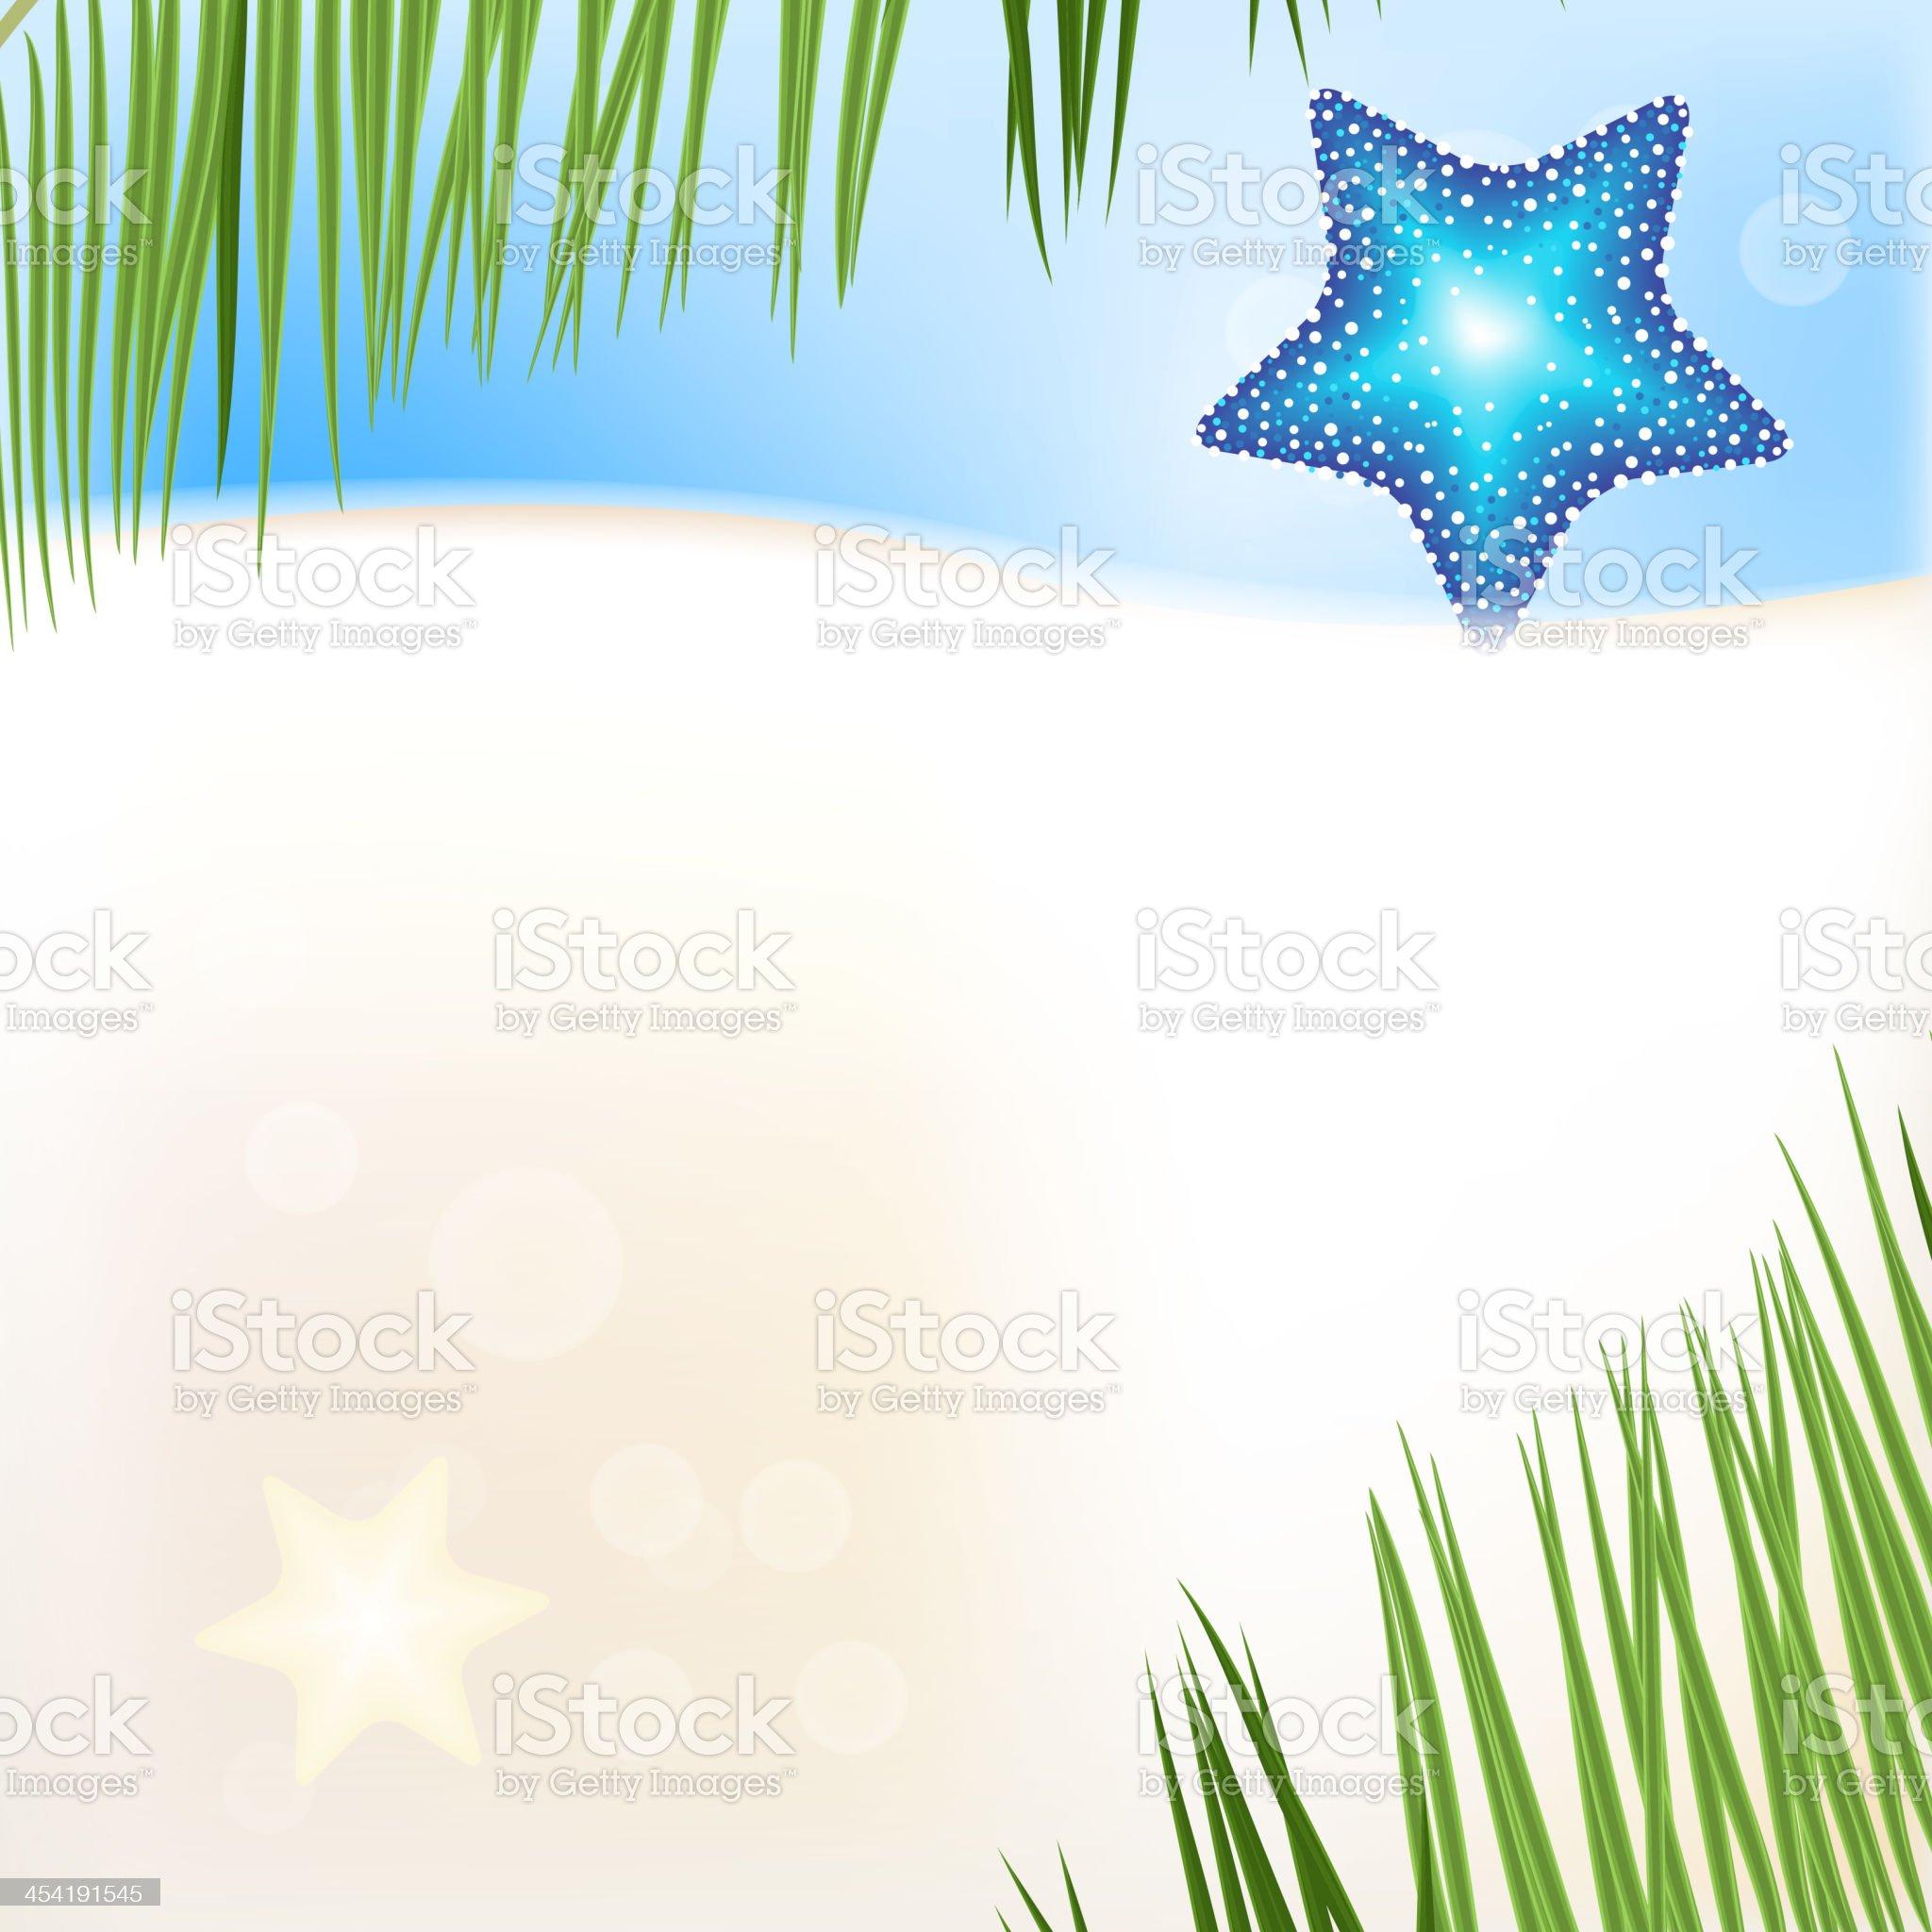 Sand_background_e royalty-free stock vector art